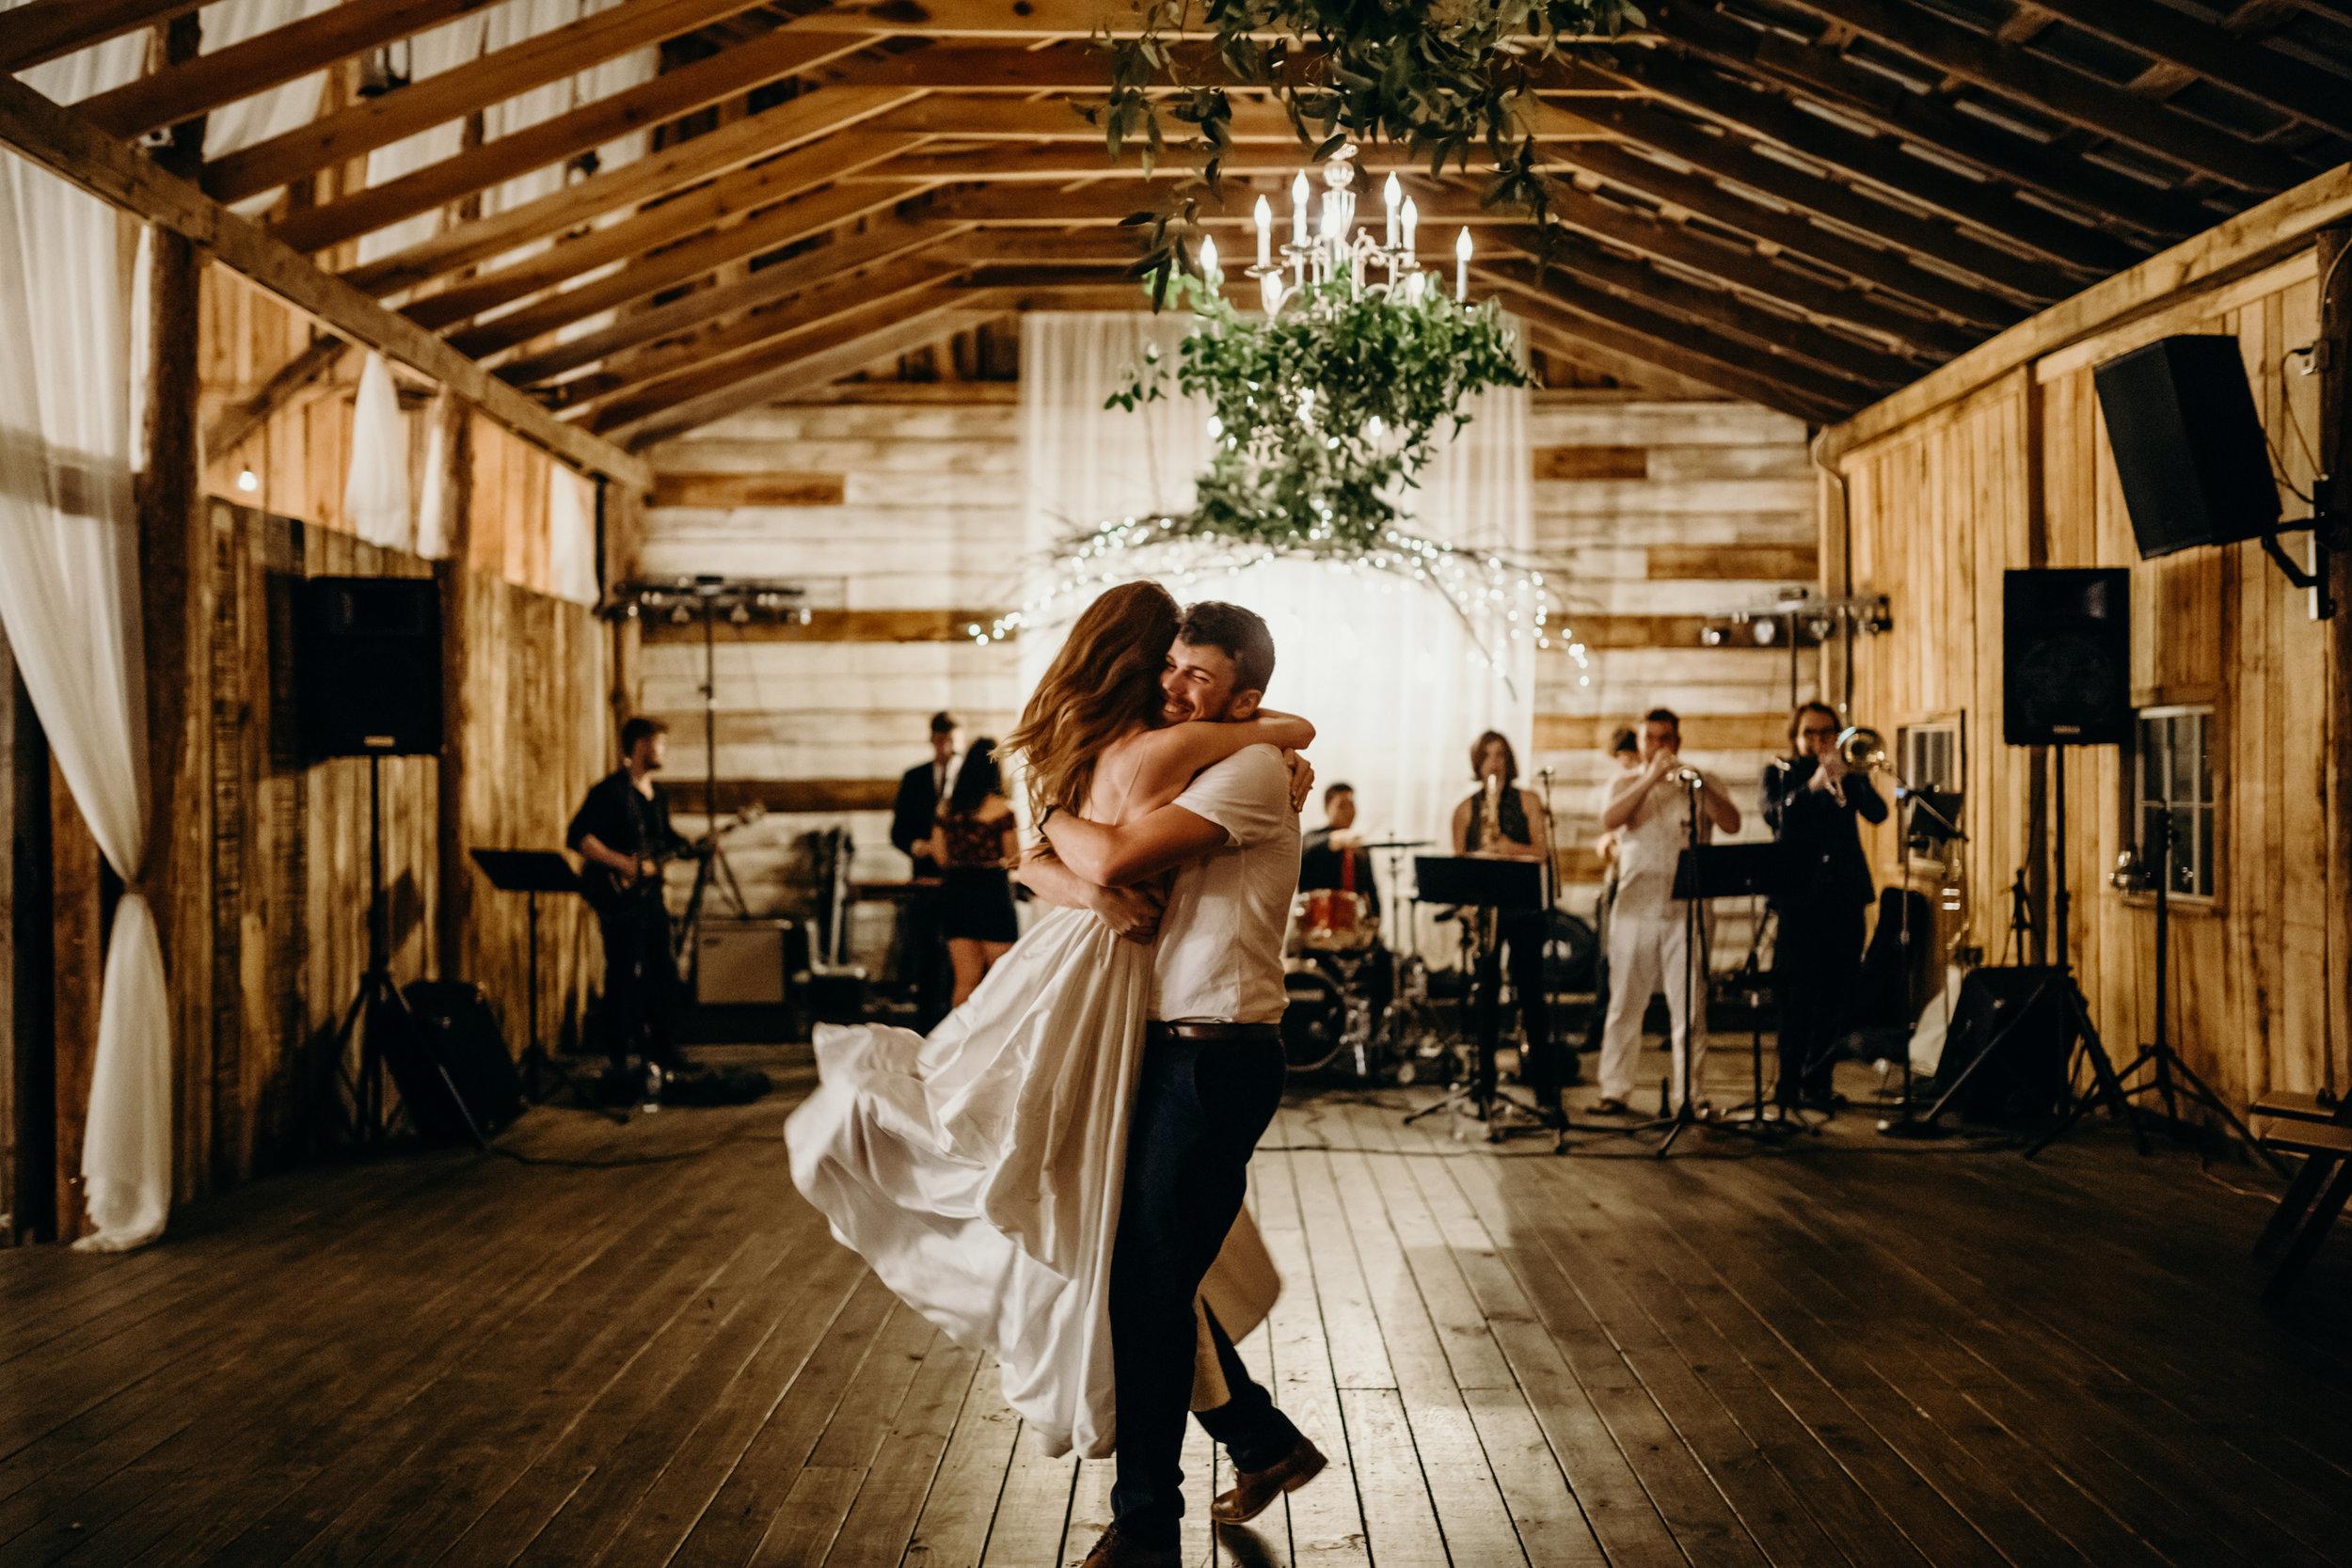 First dance under greenery chandeliers // Meadow Hill Farm Wedding, Nashville, TN